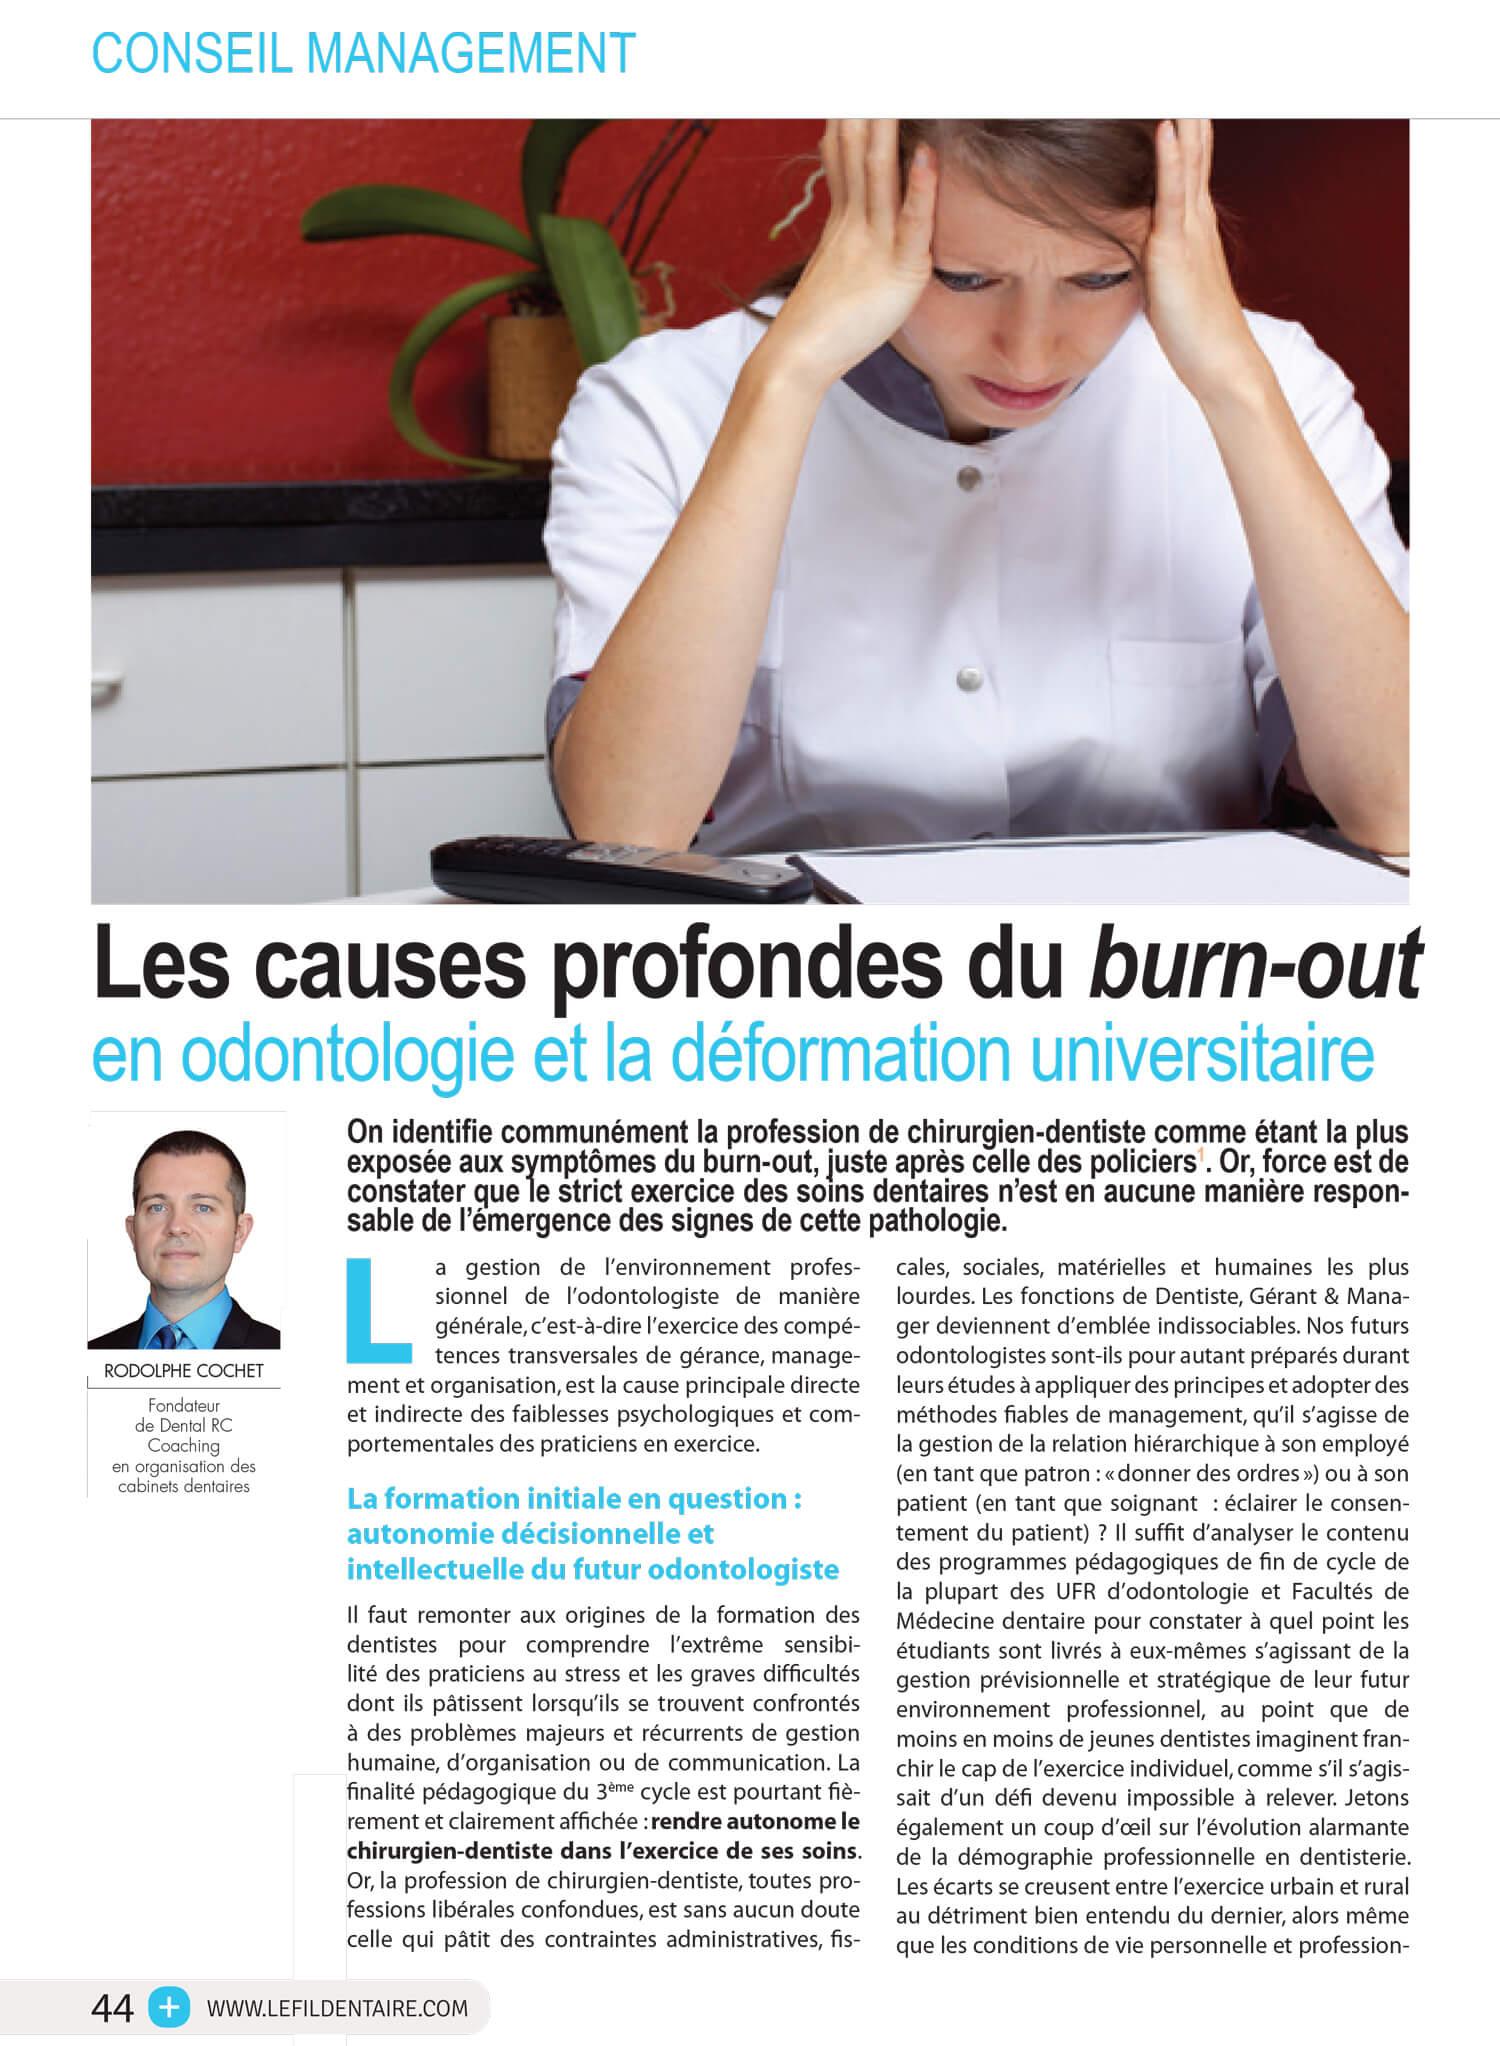 les-causes-burnout-dentiste-solutions-cabinet-dentaire-gestion-rodolphe-cochet.jpg